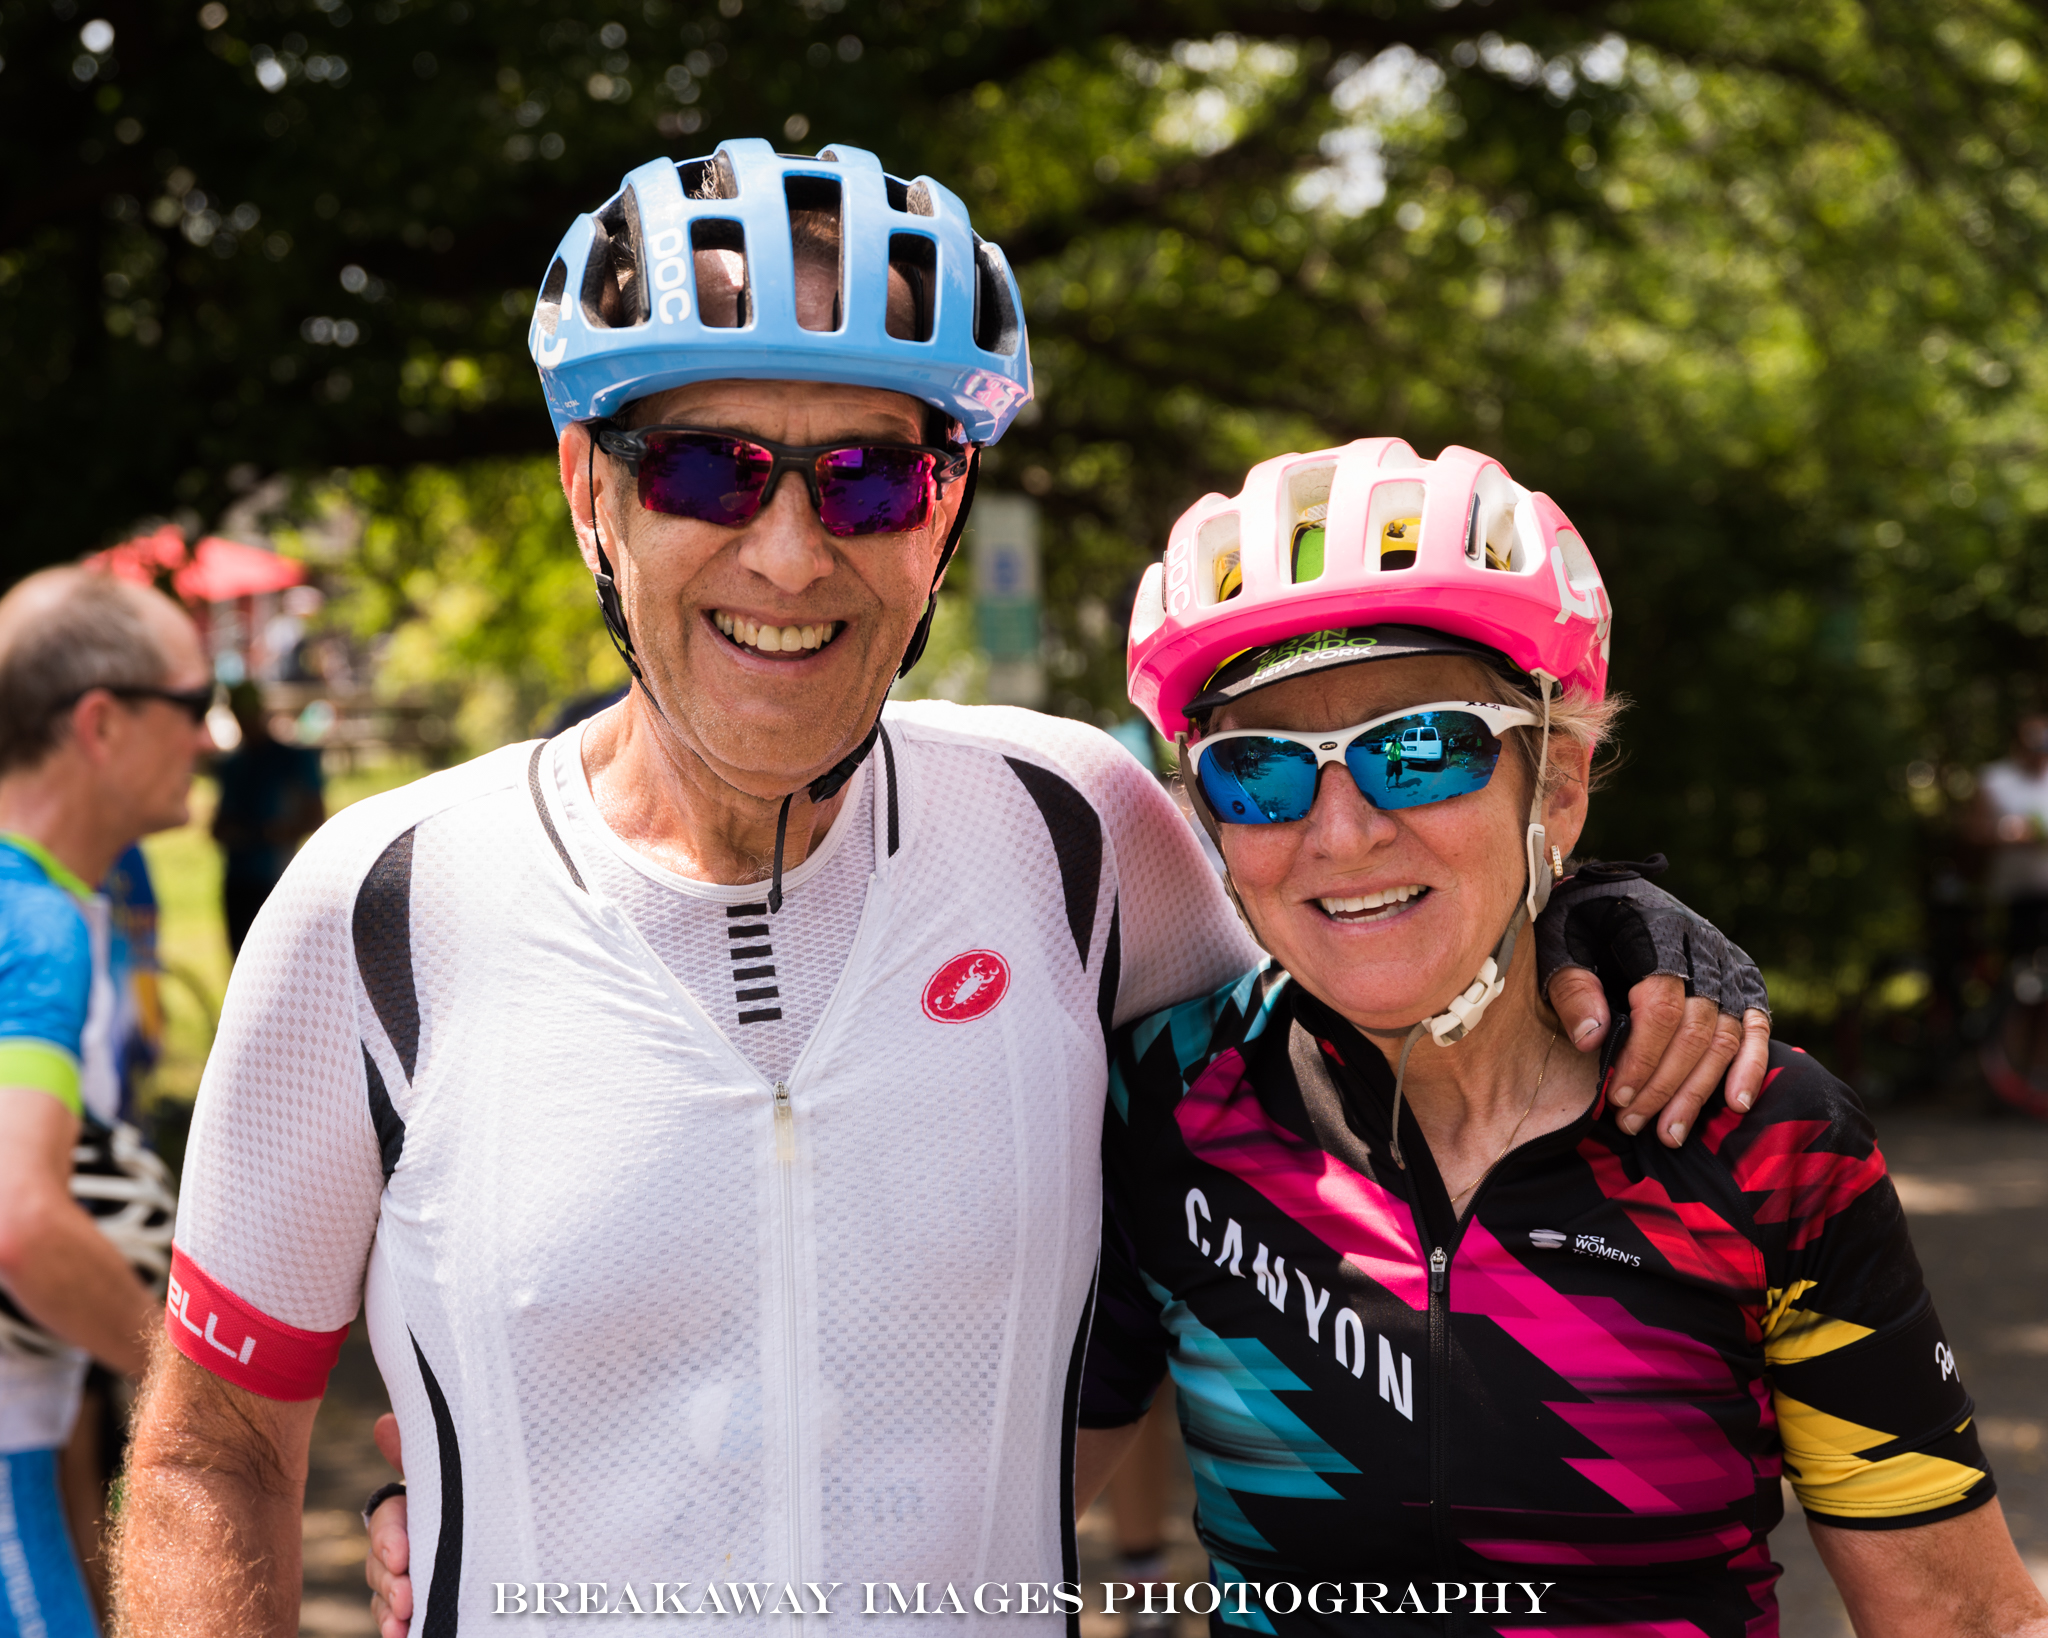 Minnie and Dan Scrafford at the 2018 Reston Century Bike Ride